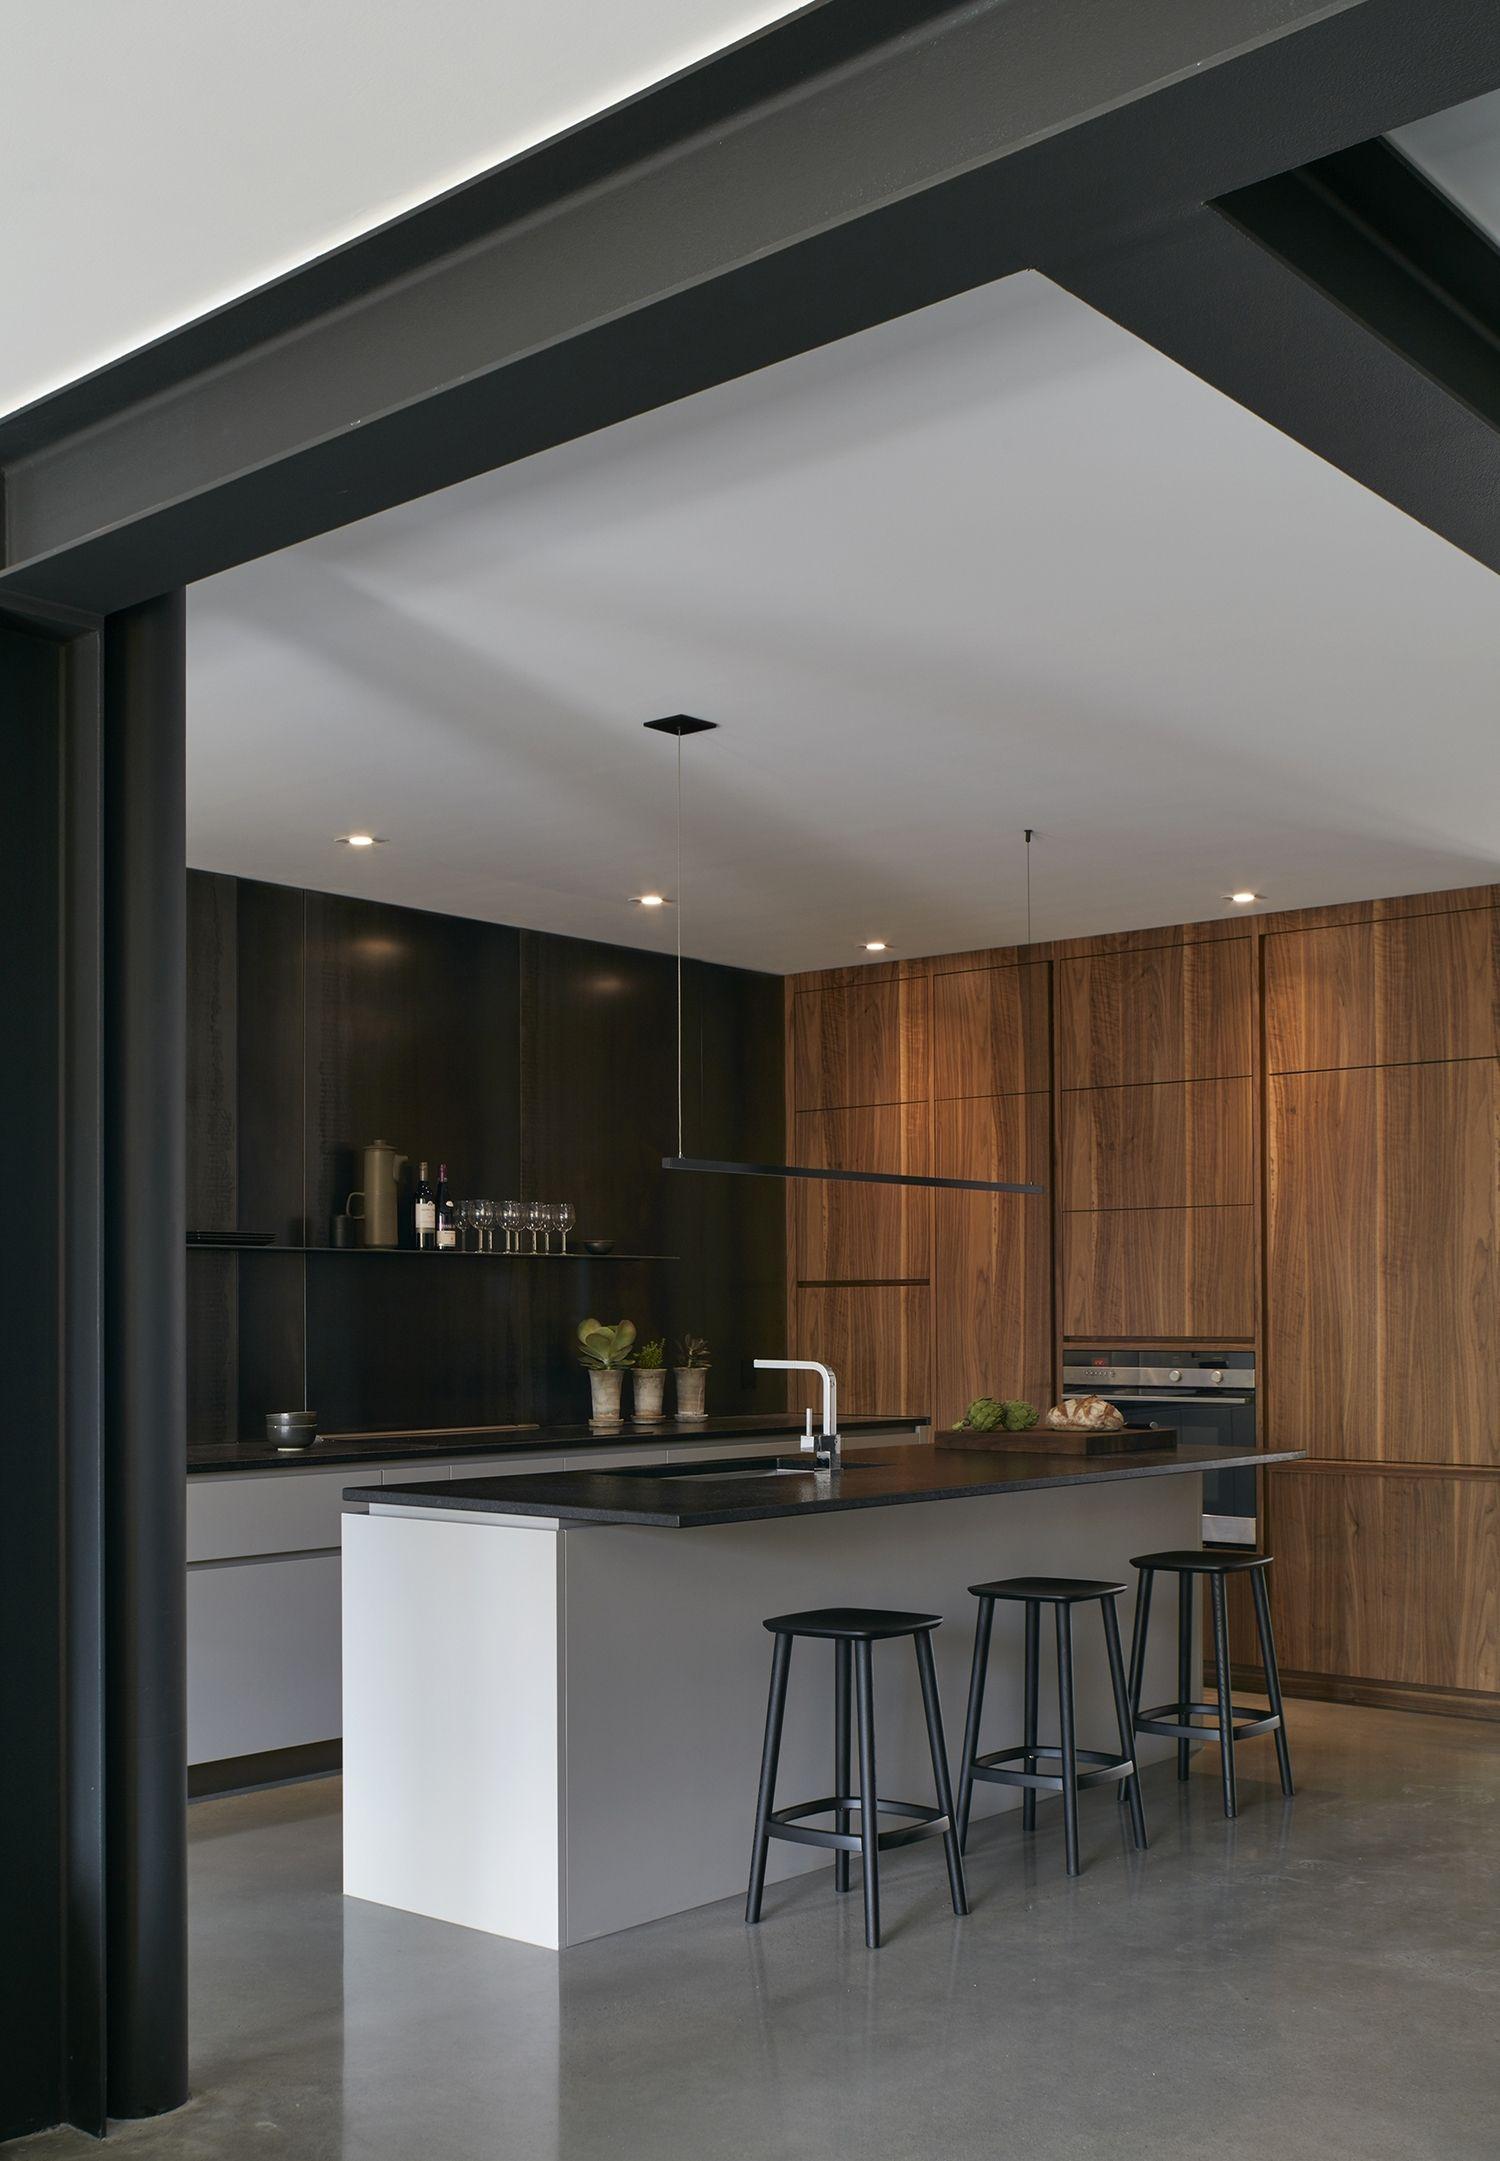 Lafontaine g metal black frame pinterest kitchens